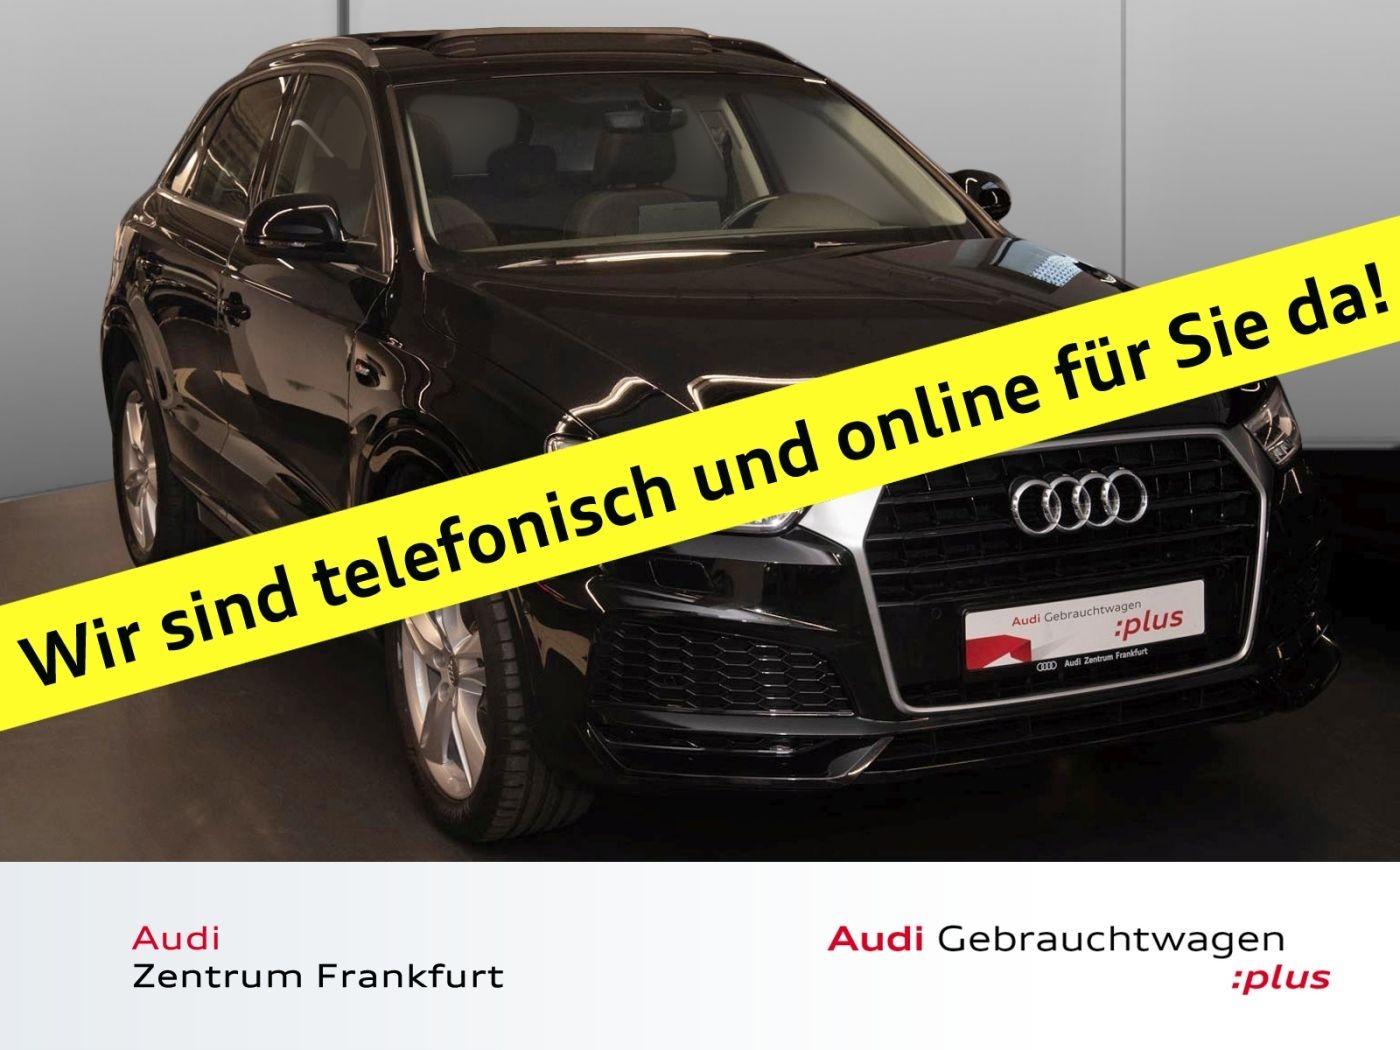 Audi Q3 2.0 TDI S tronic S line Panorama DAB Navi Sitzheizung, Jahr 2017, Diesel